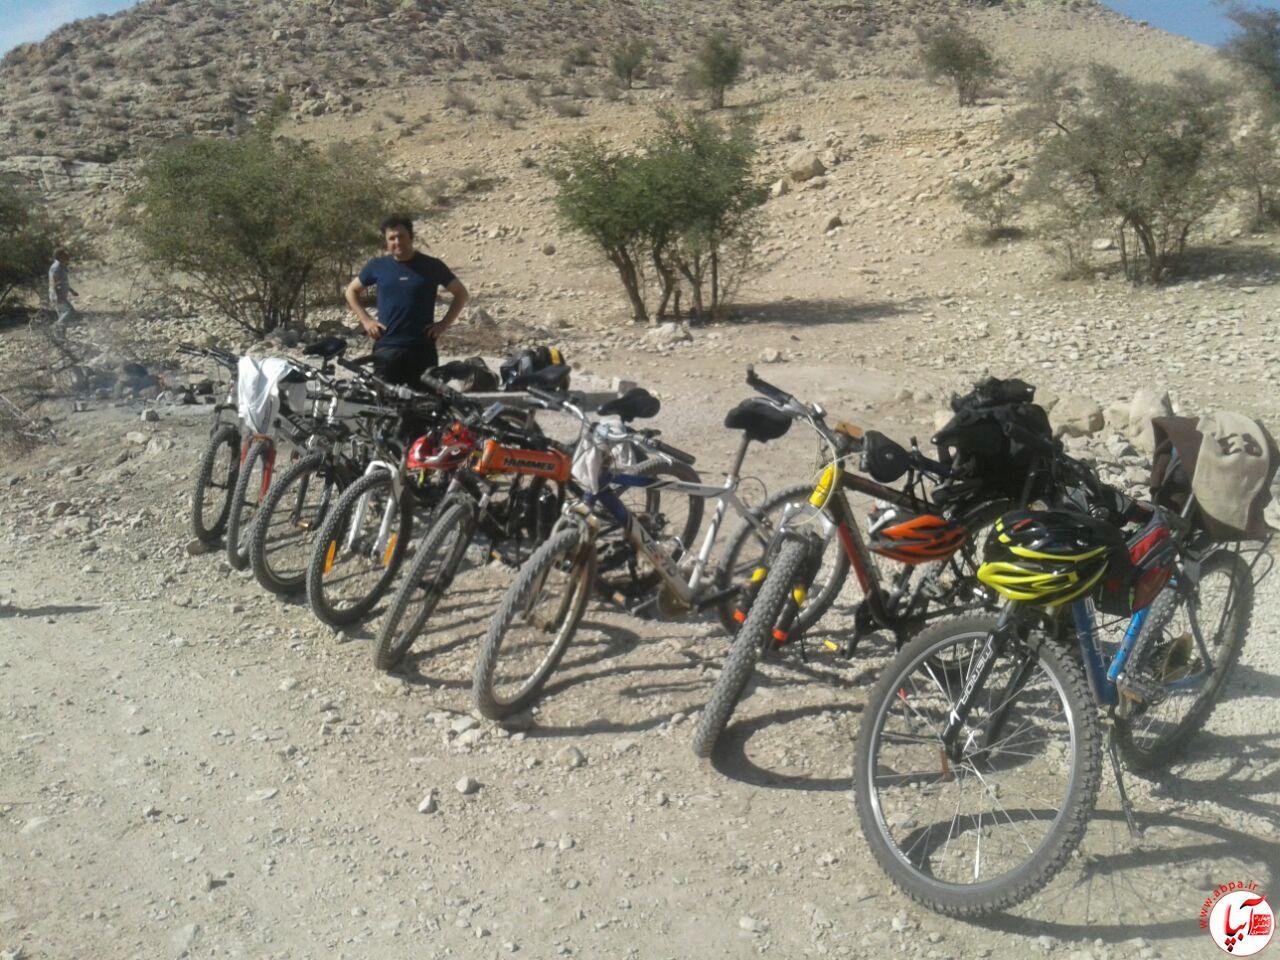 IMG-20170201-WA0004 توسعه فرهنگی با رکاب دوچرخه سواران